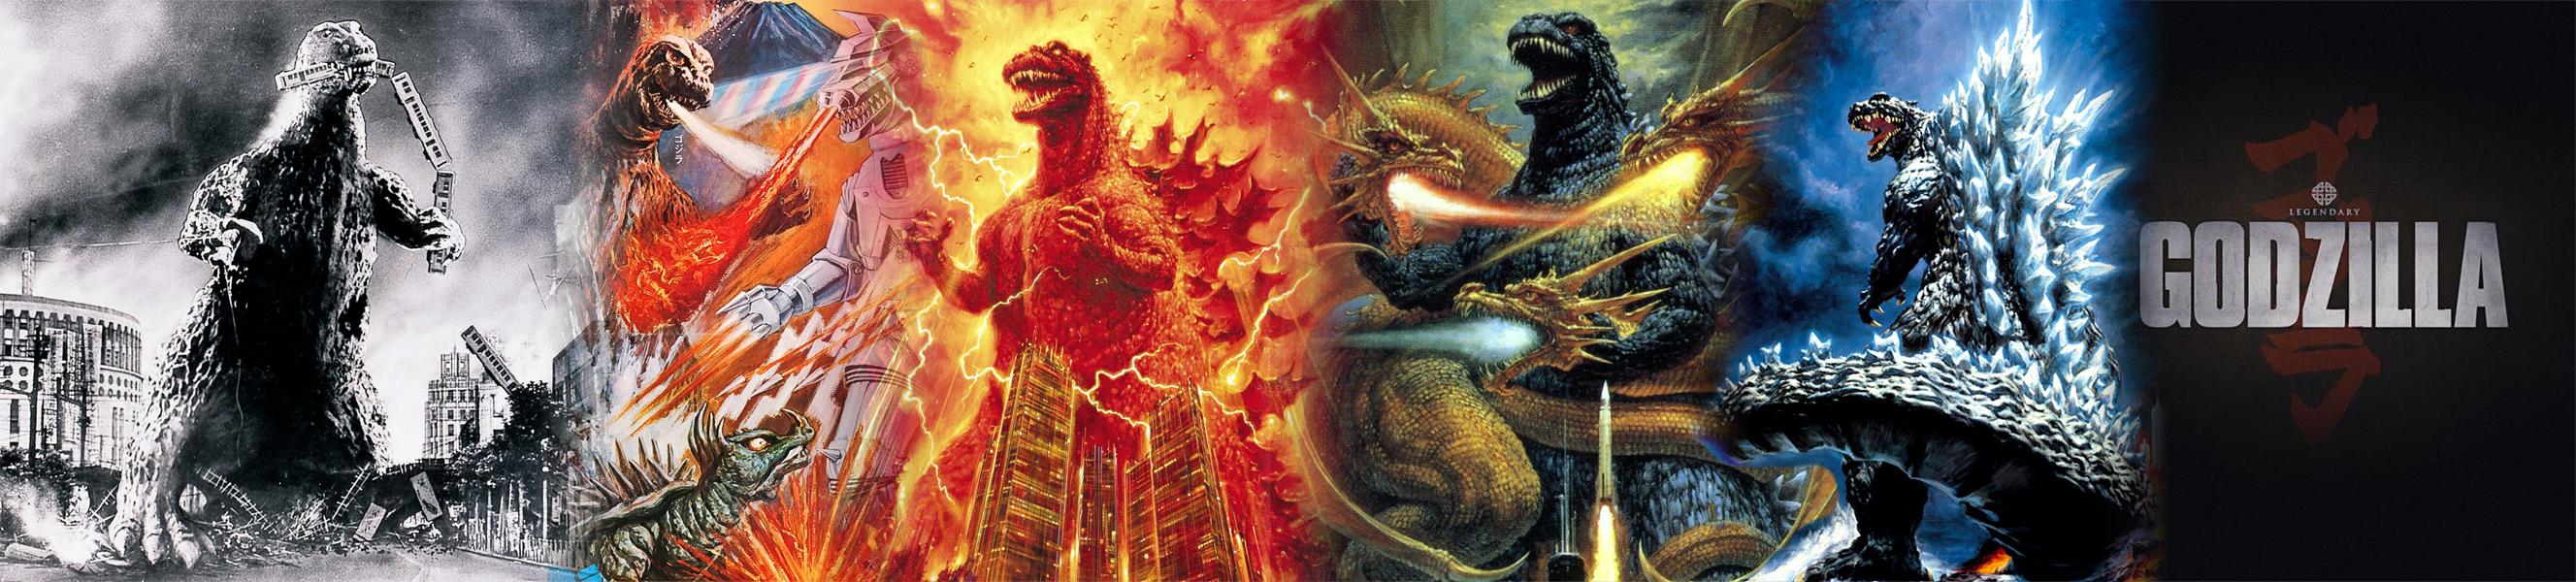 Banner Godzilla